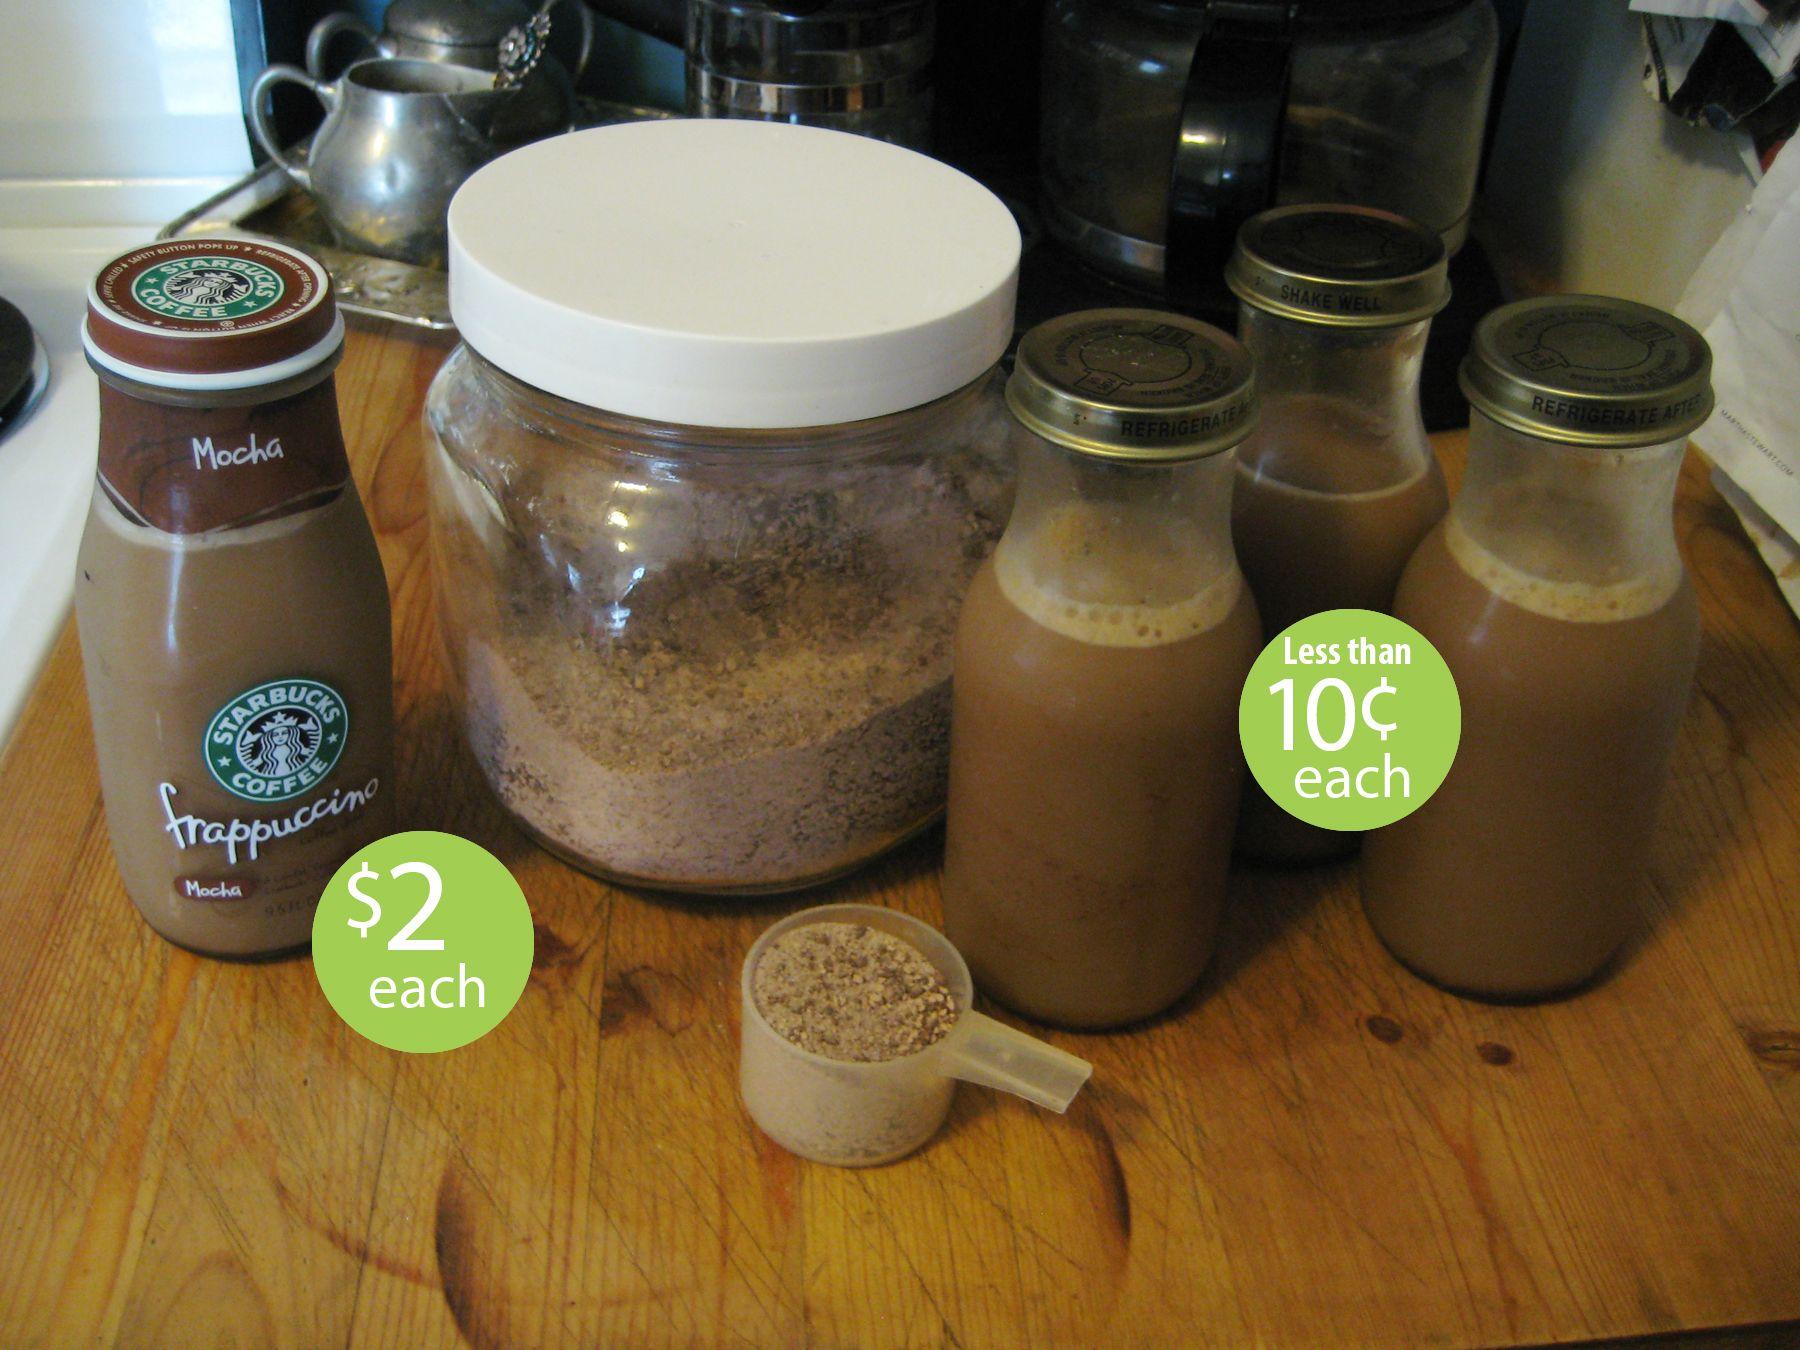 Homemade cold frappucino mix starbucks bottles coffee